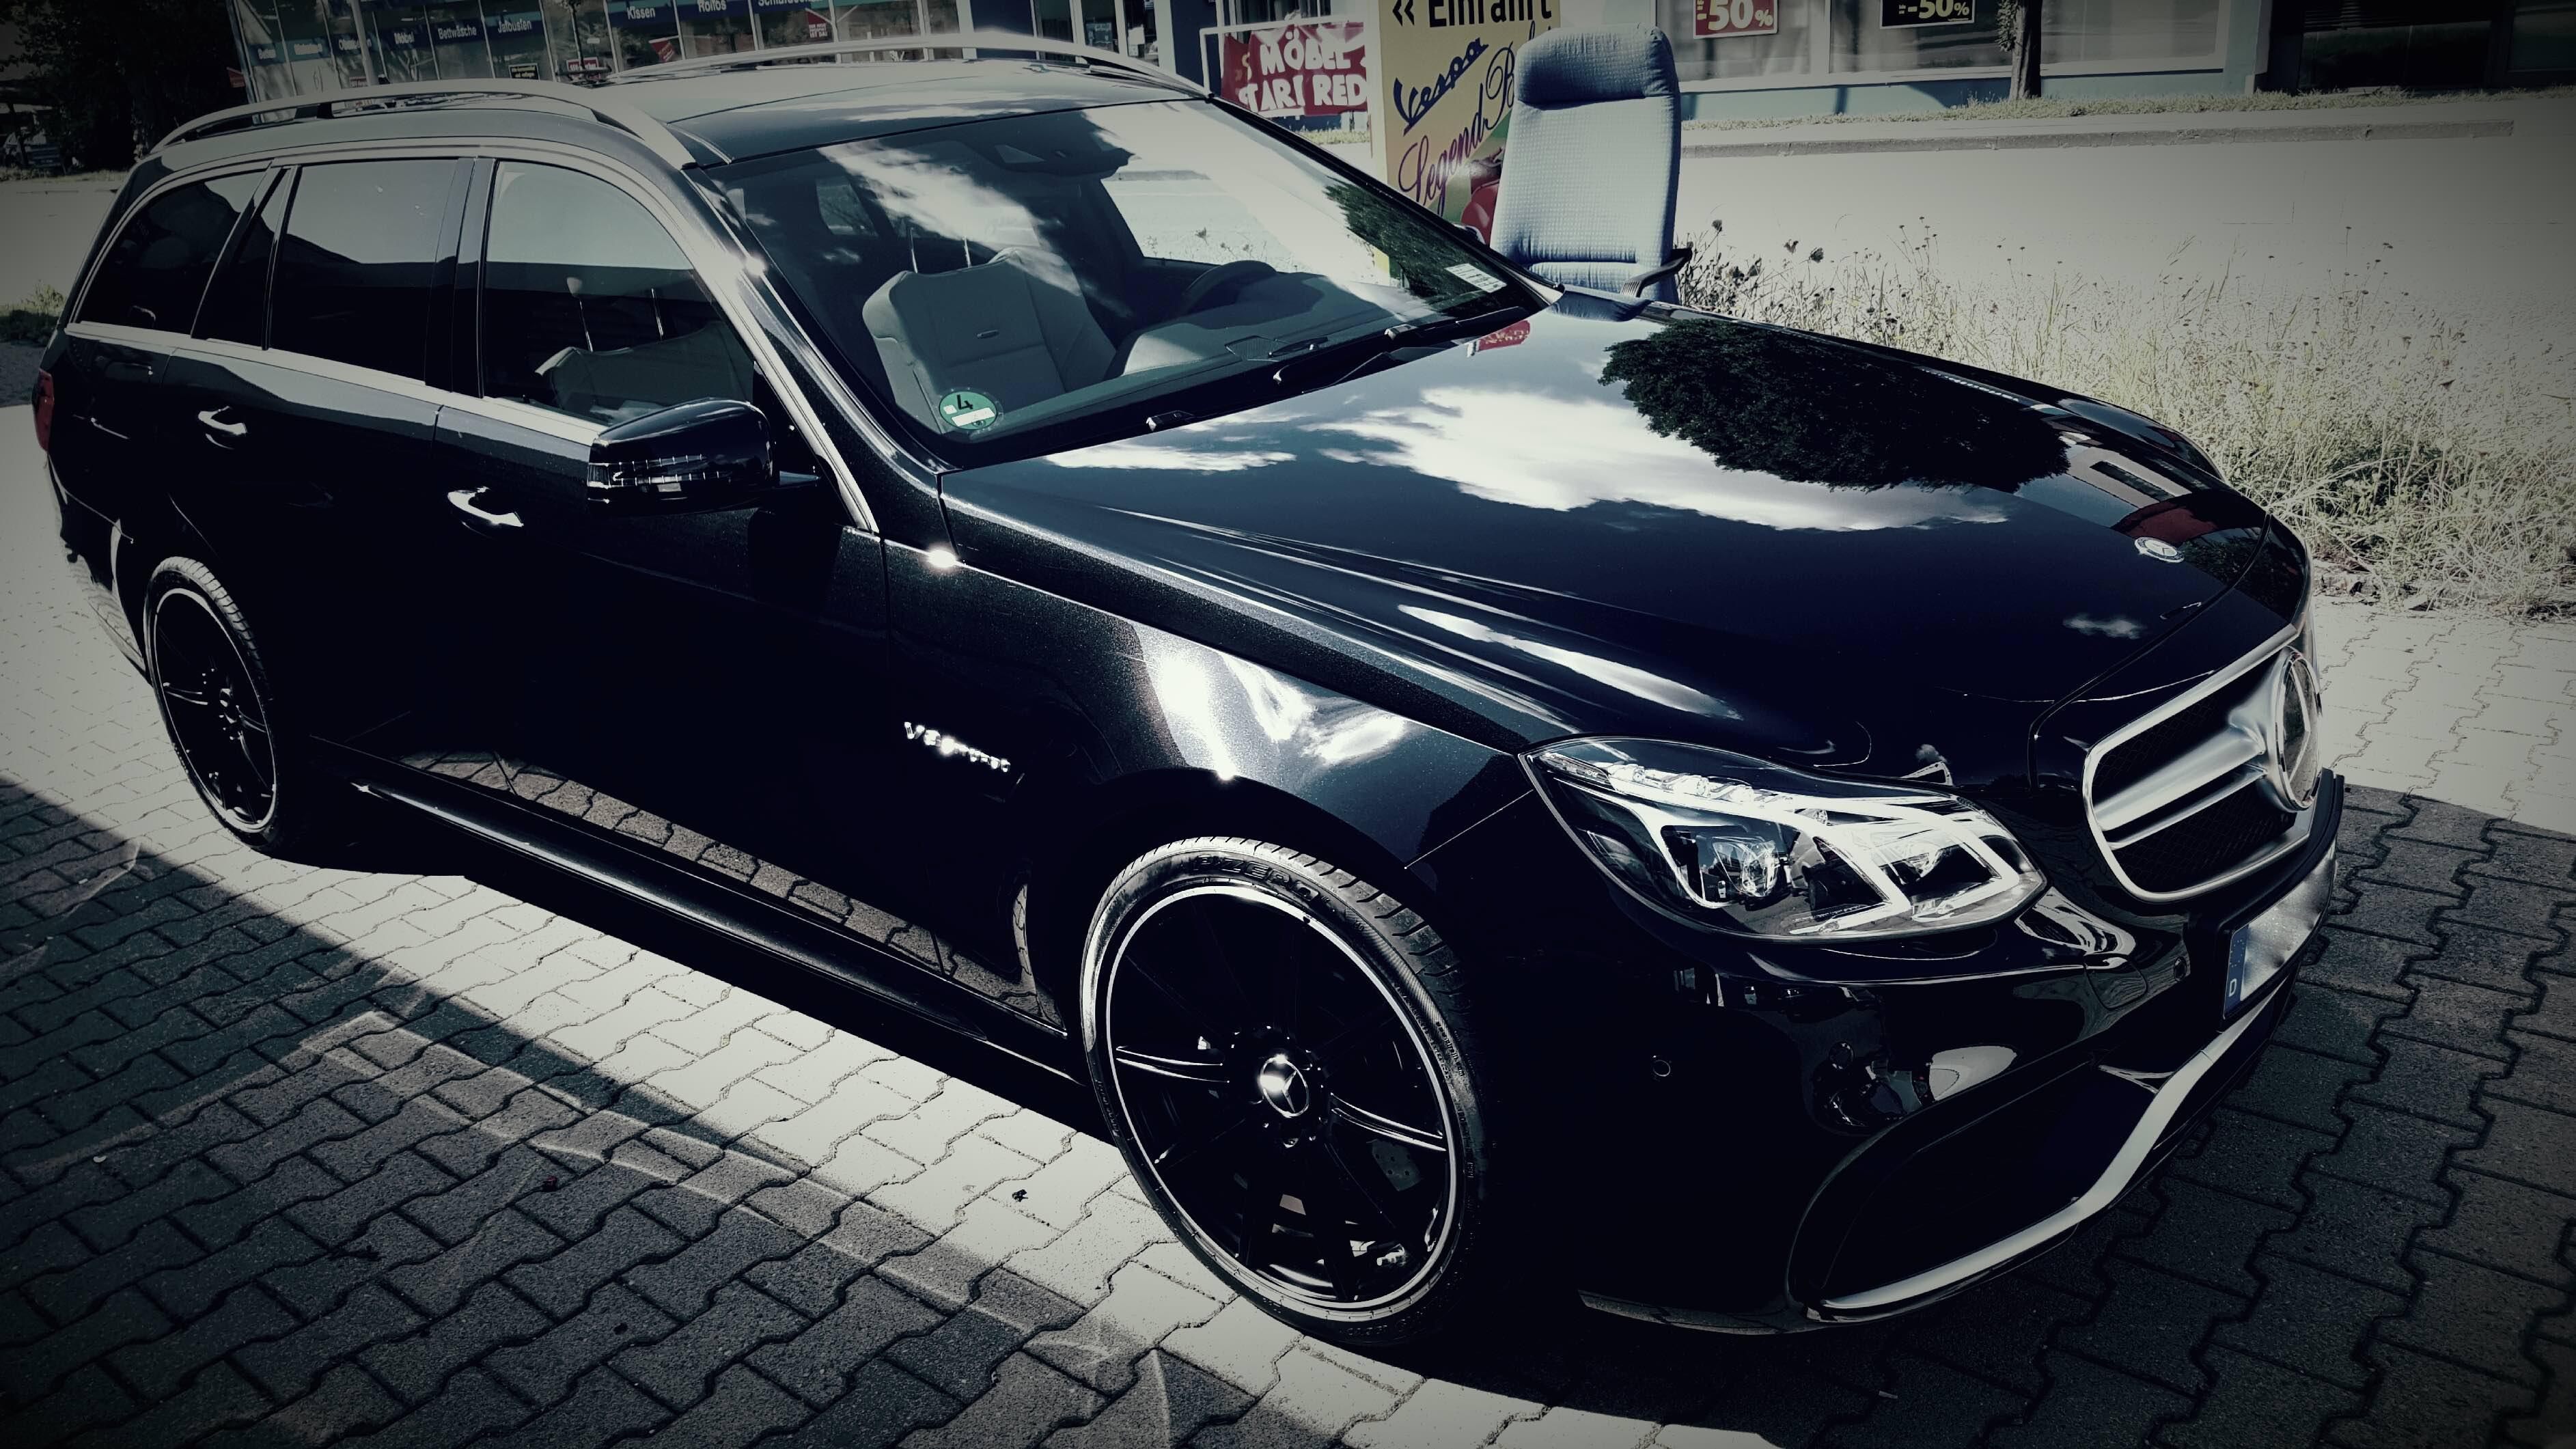 Mercedes AMG V8 BiTurbo